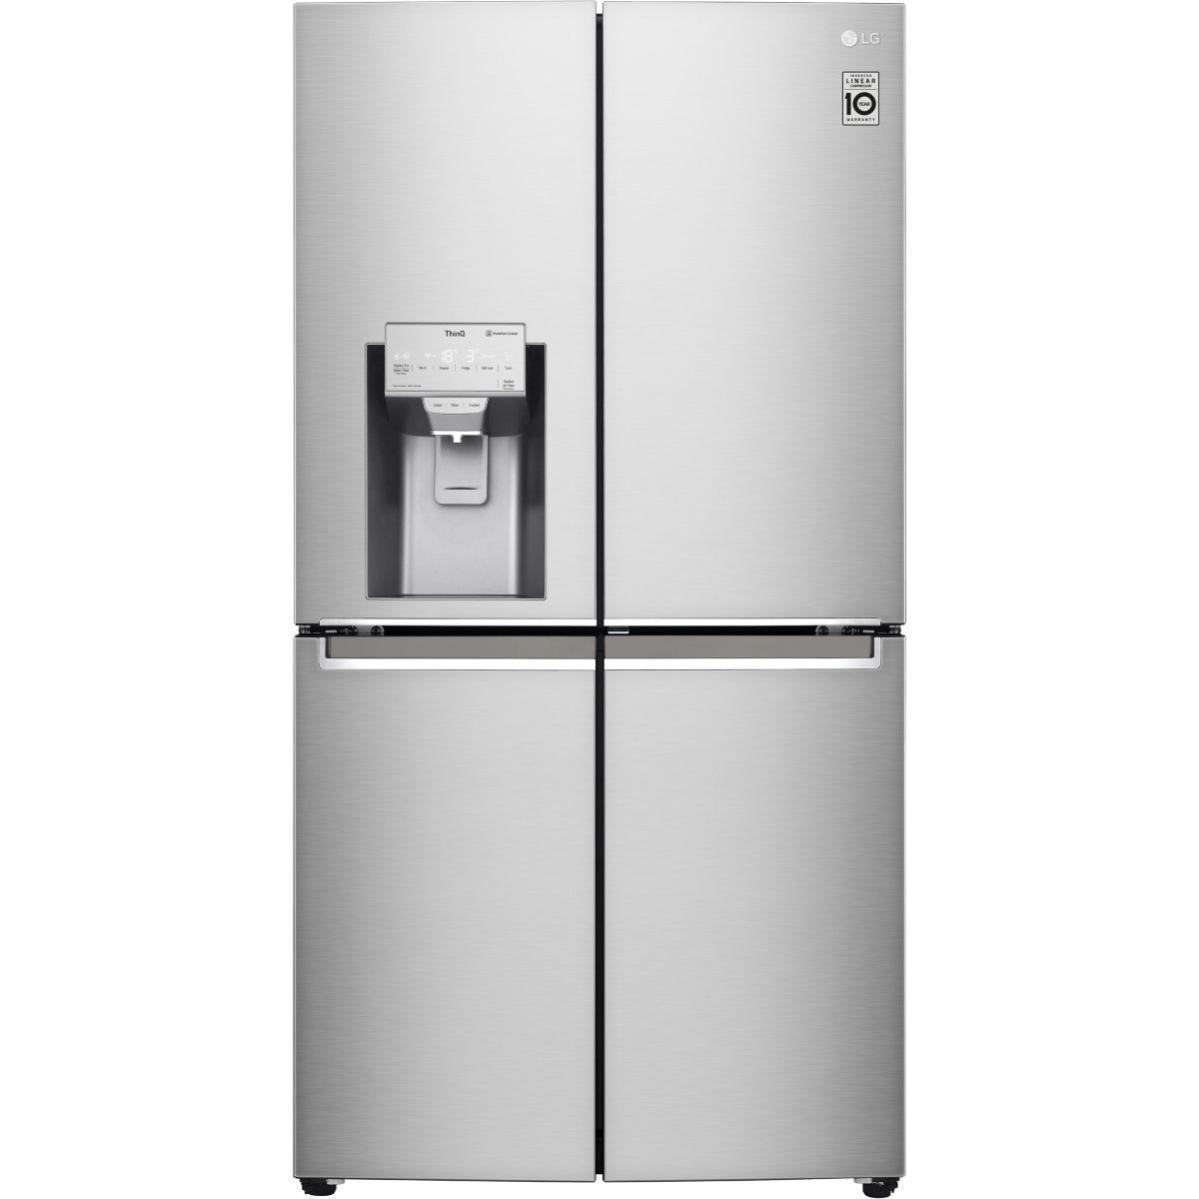 Photo Réfrigérateur Américain LG GMJ945NS9F